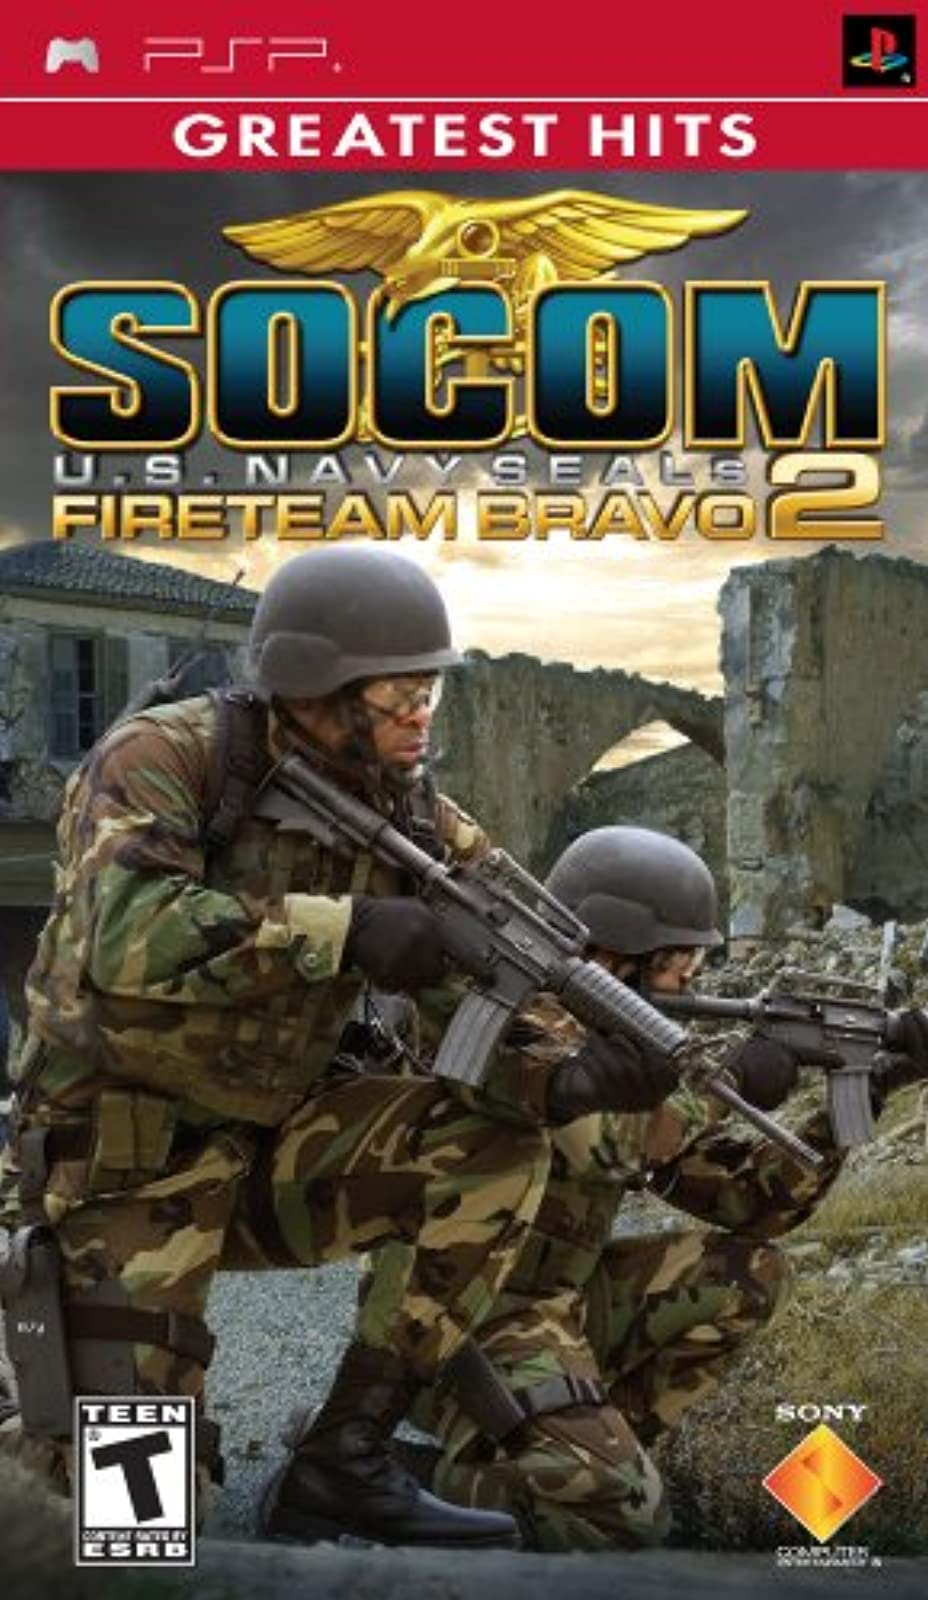 Socom US Navy Seals Fireteam Bravo 2 Sony For PSP UMD Shooter